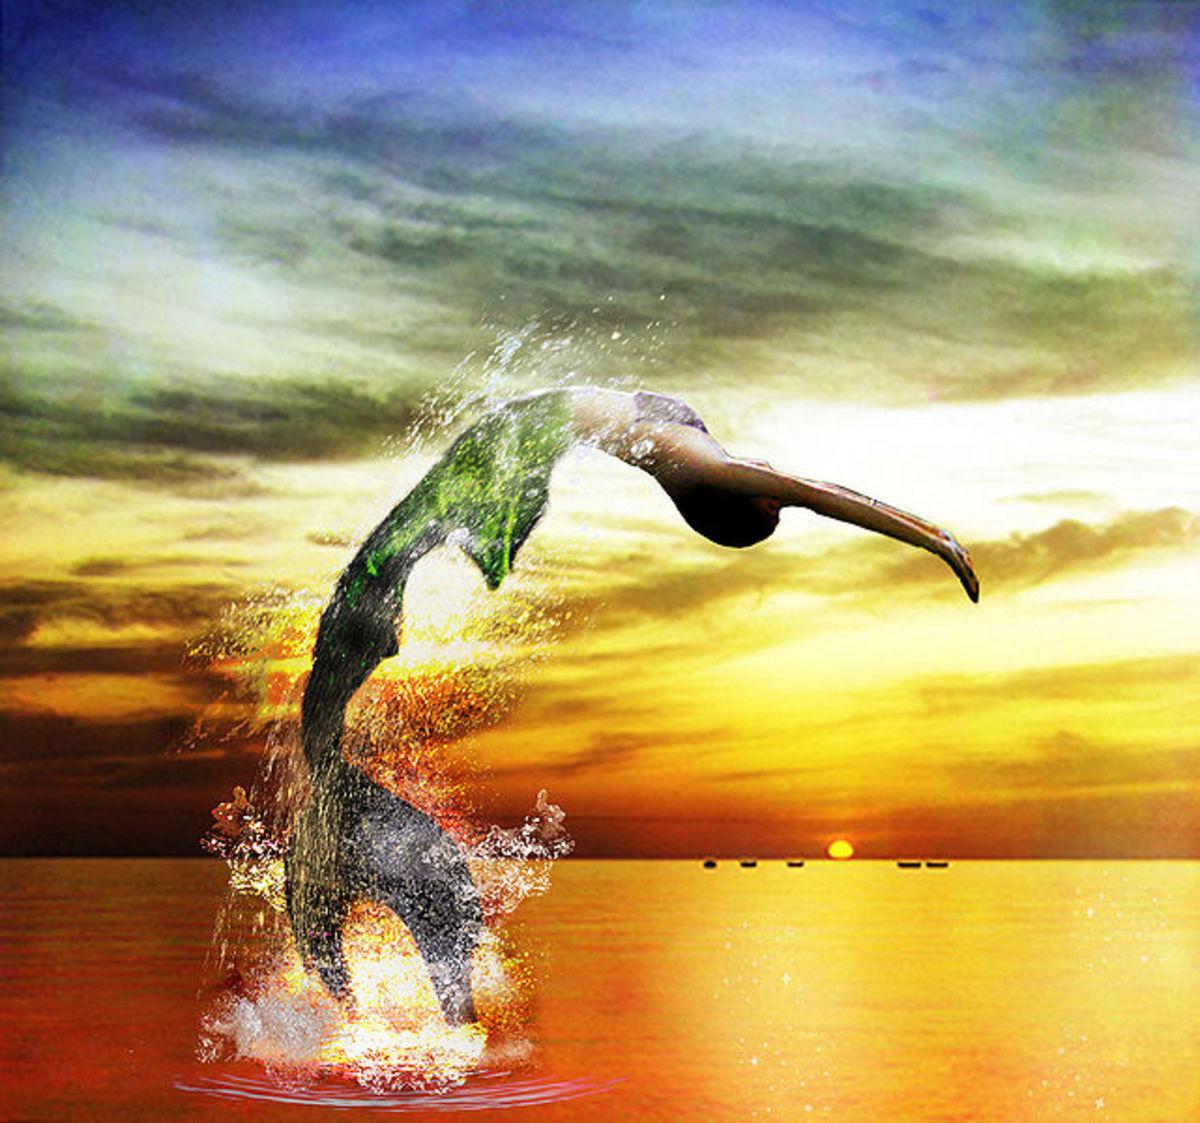 Does Aquatic Ape Theory Explain How Mermaids Really Exist?